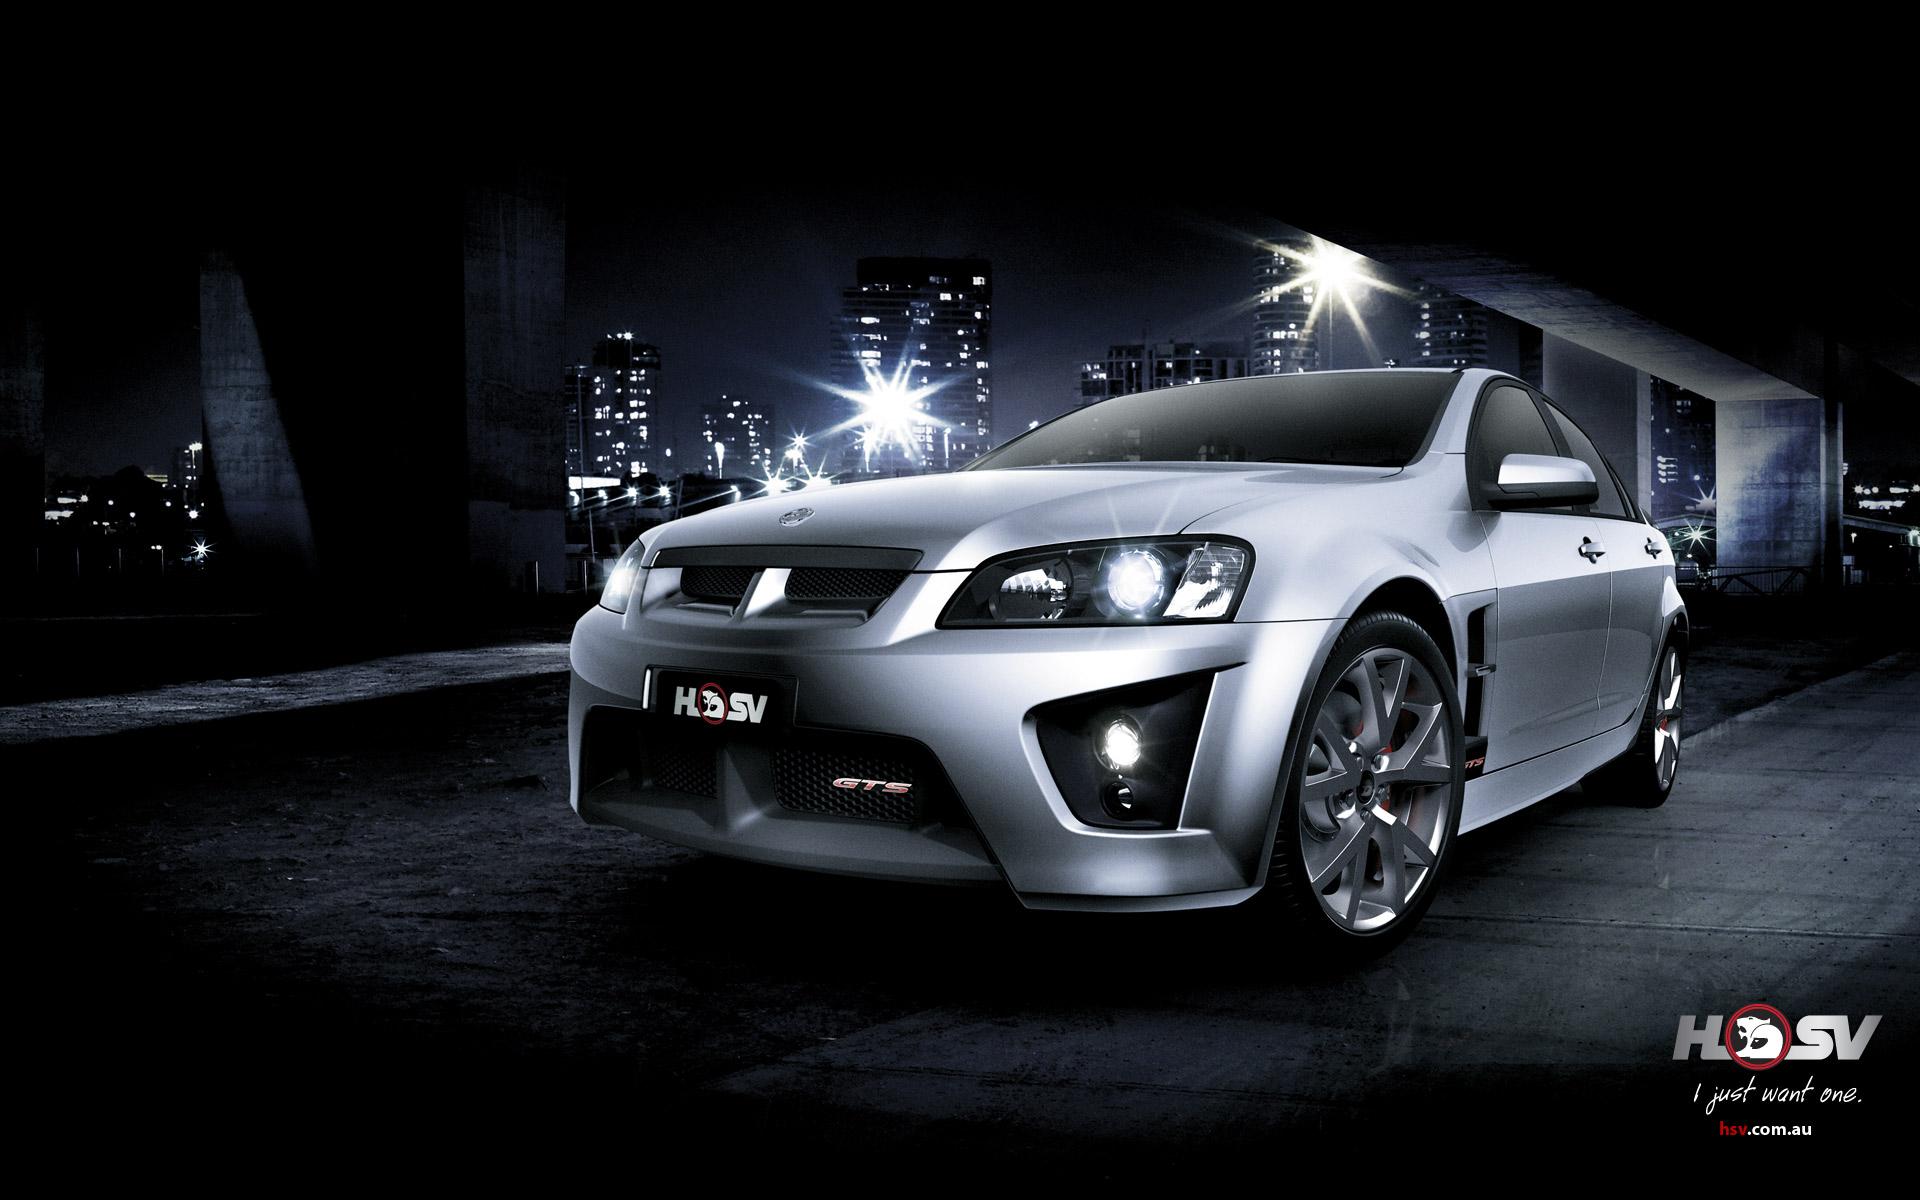 All Cars Symbols Wallpaper Free Download High Quality E Series Ls2 Gts Hsv Wallpaper